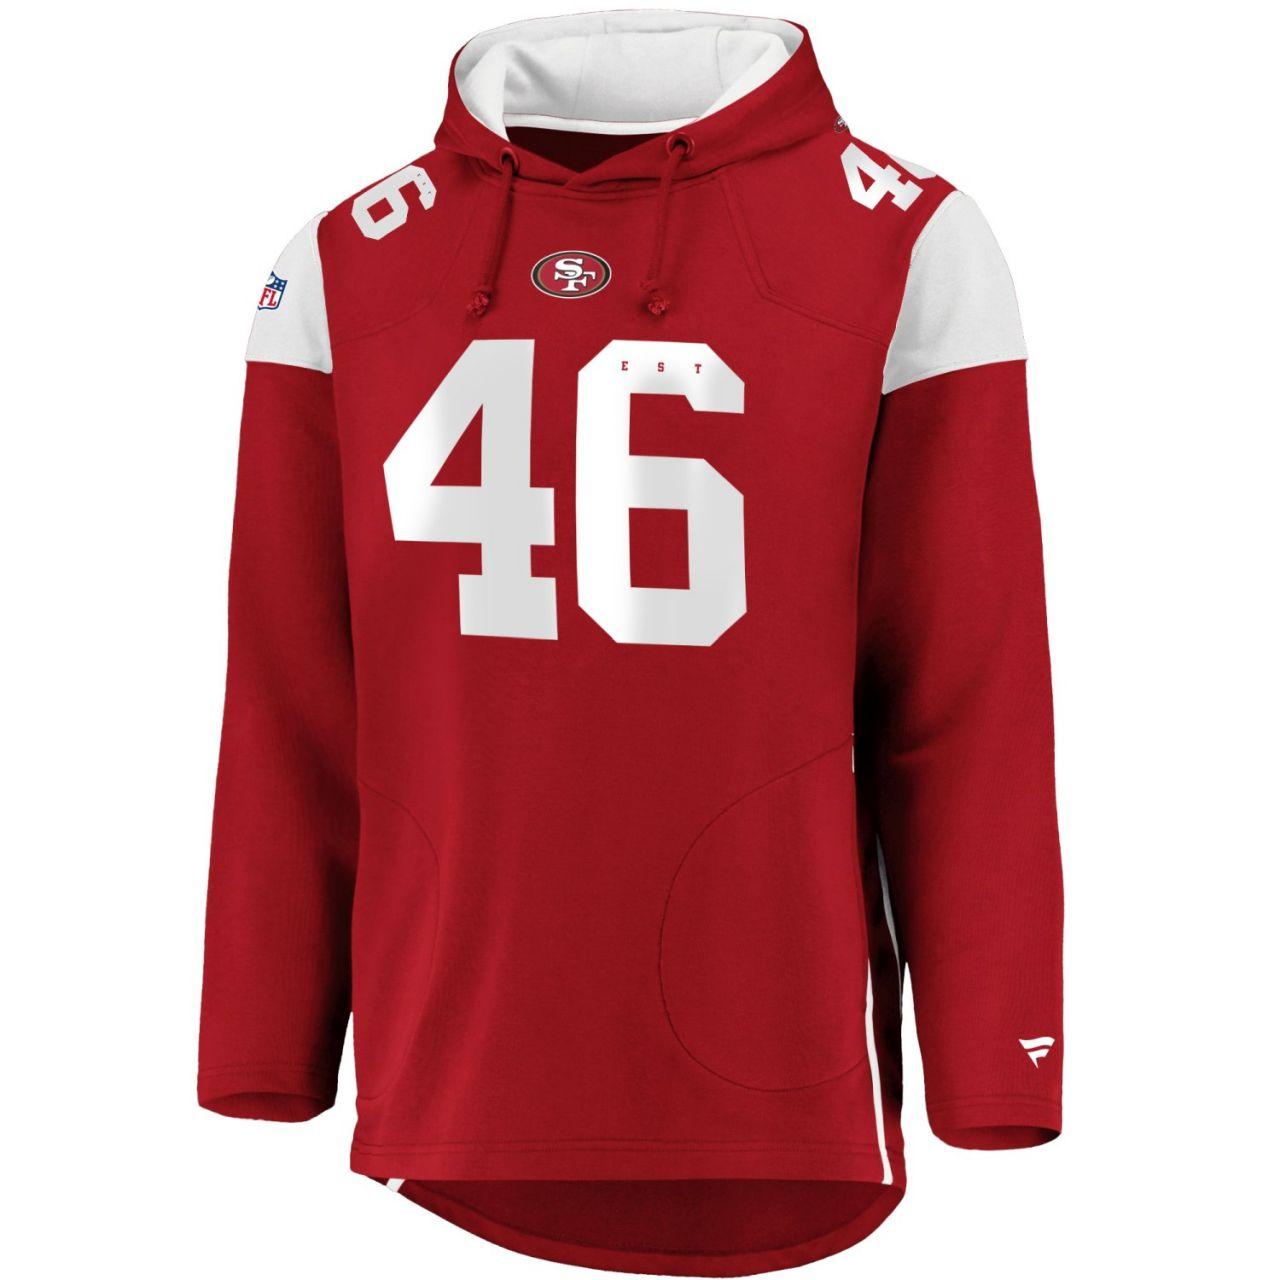 amfoo - Iconic Franchise Long Hoodie - NFL San Francisco 49ers